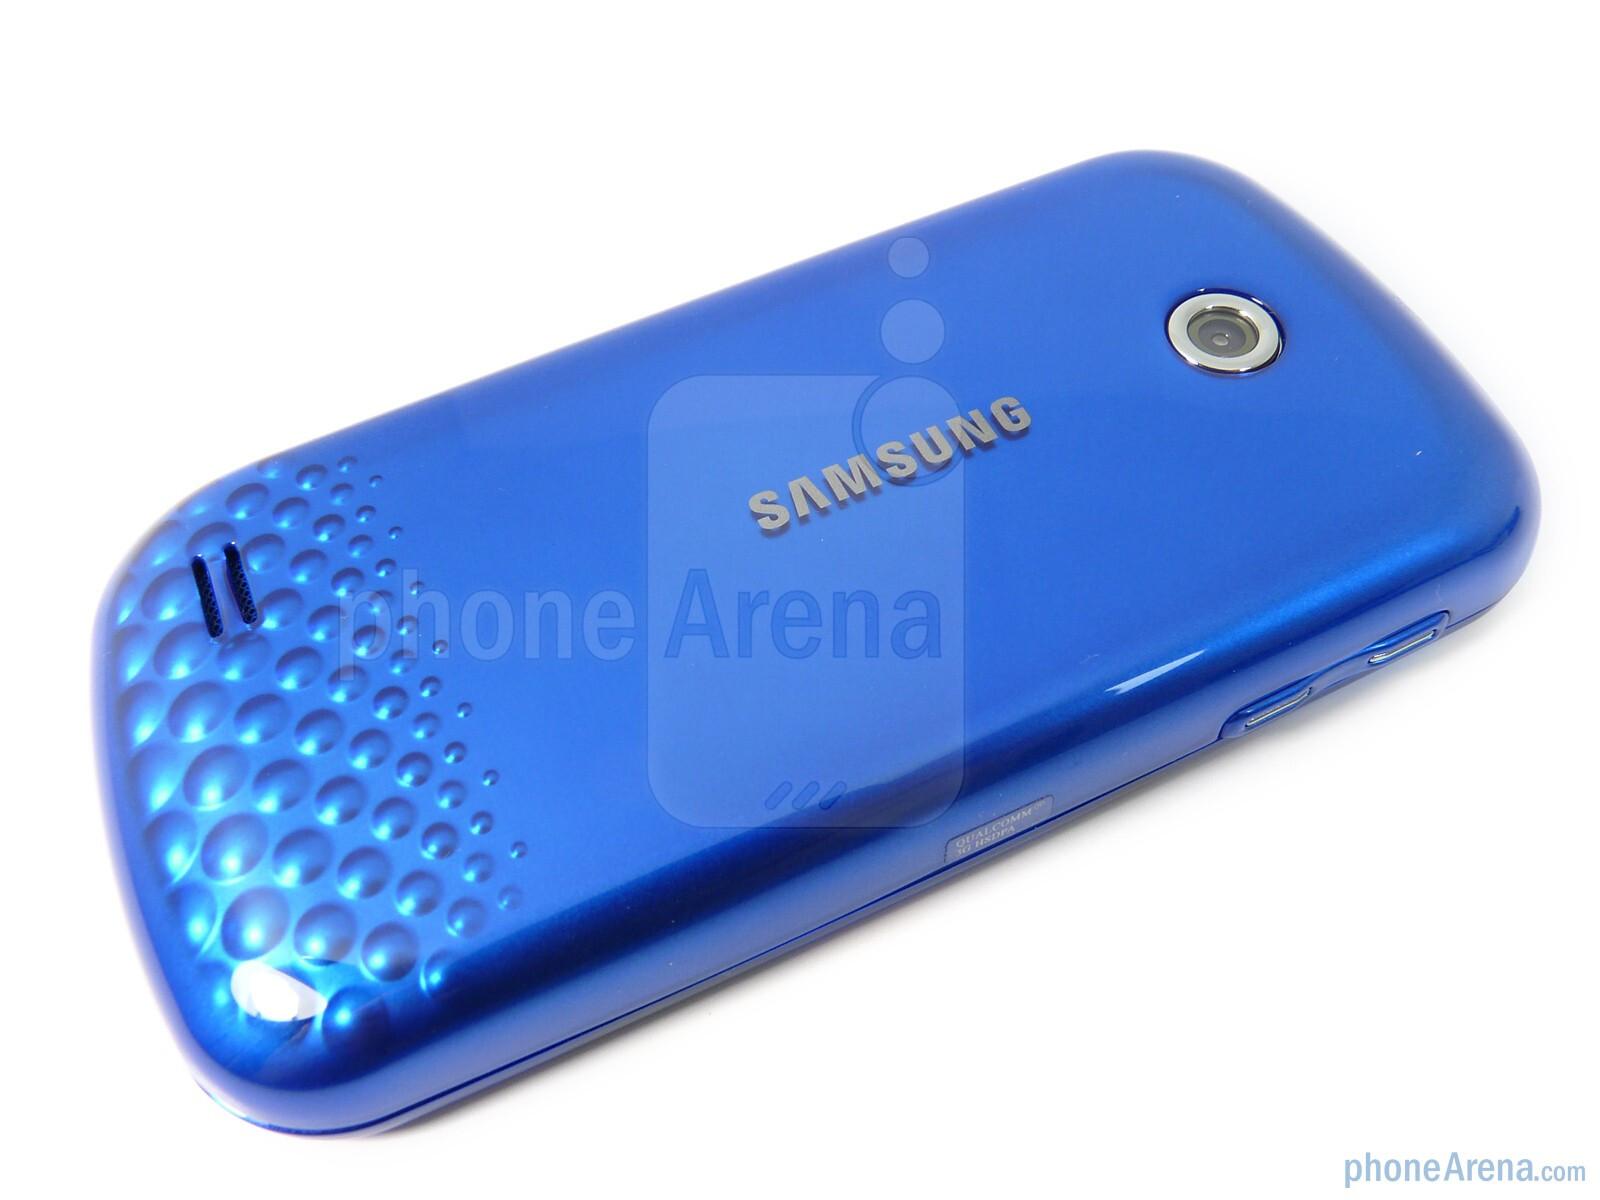 samsung eternity ii phone manual how to and user guide instructions u2022 rh taxibermuda co Samsung SGH A867 Manual AT&T Samsung SGH A867 Eternity